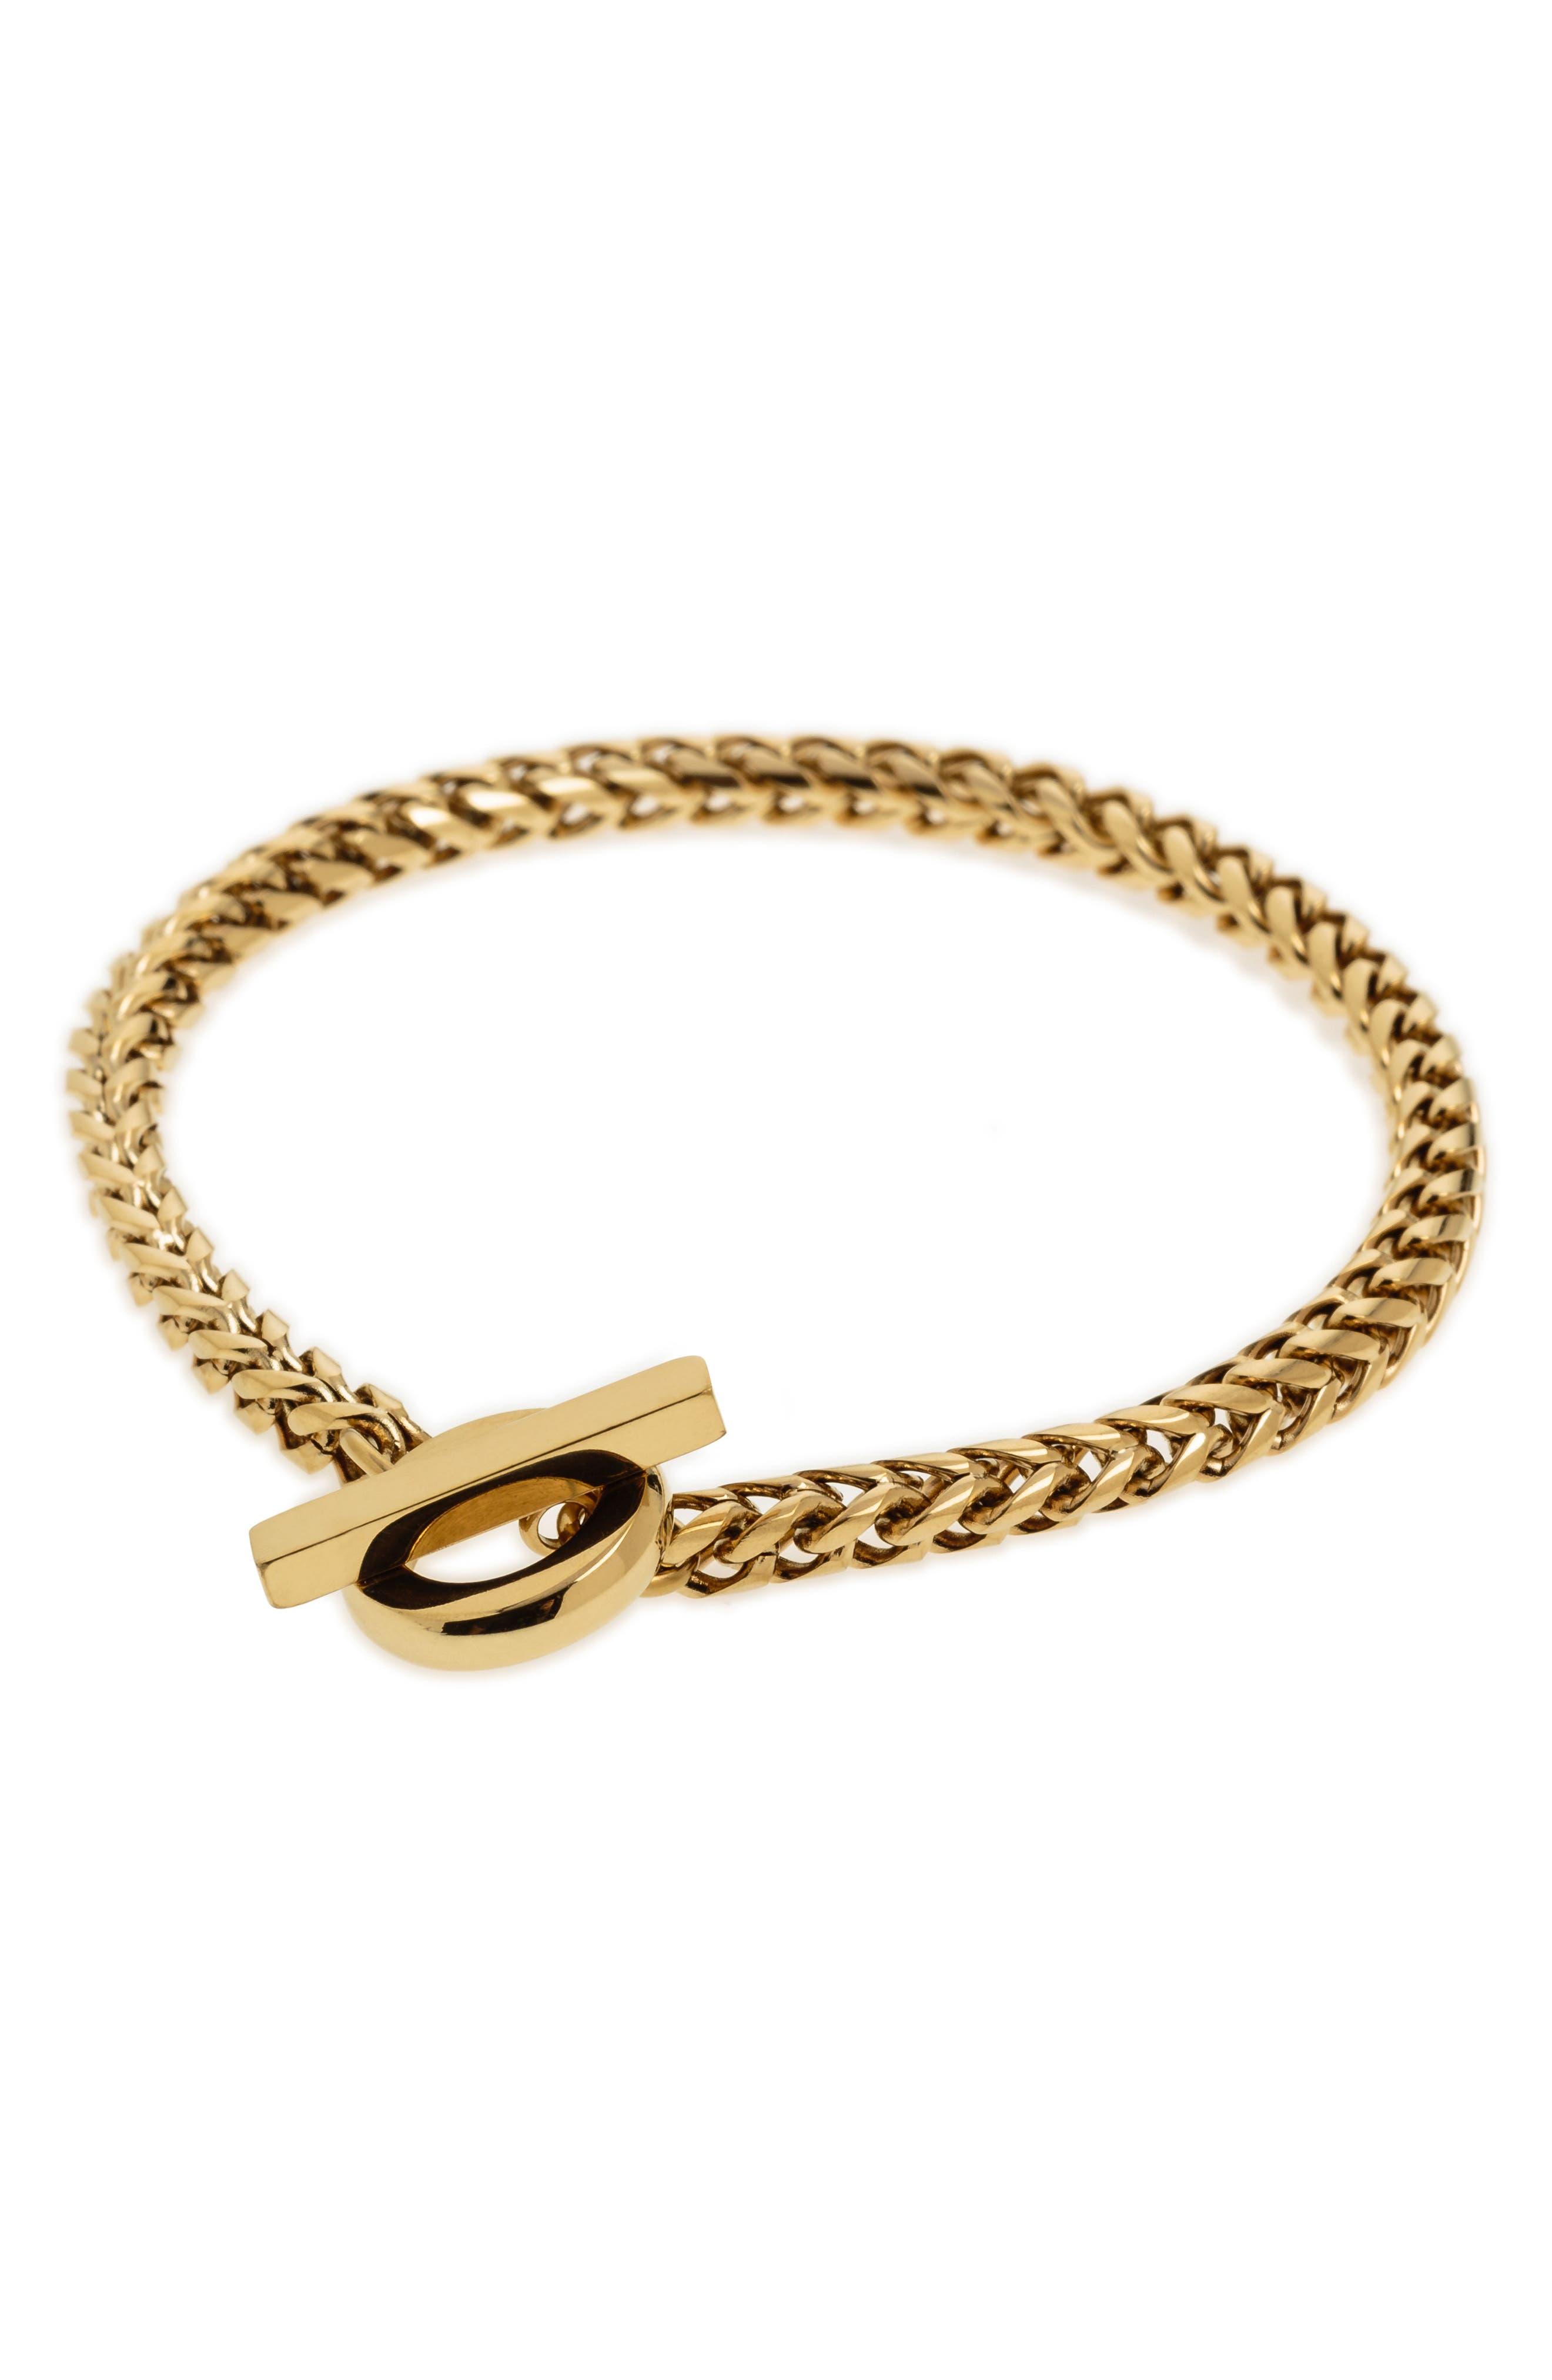 Vitaly Cirkel Chain Bracelet